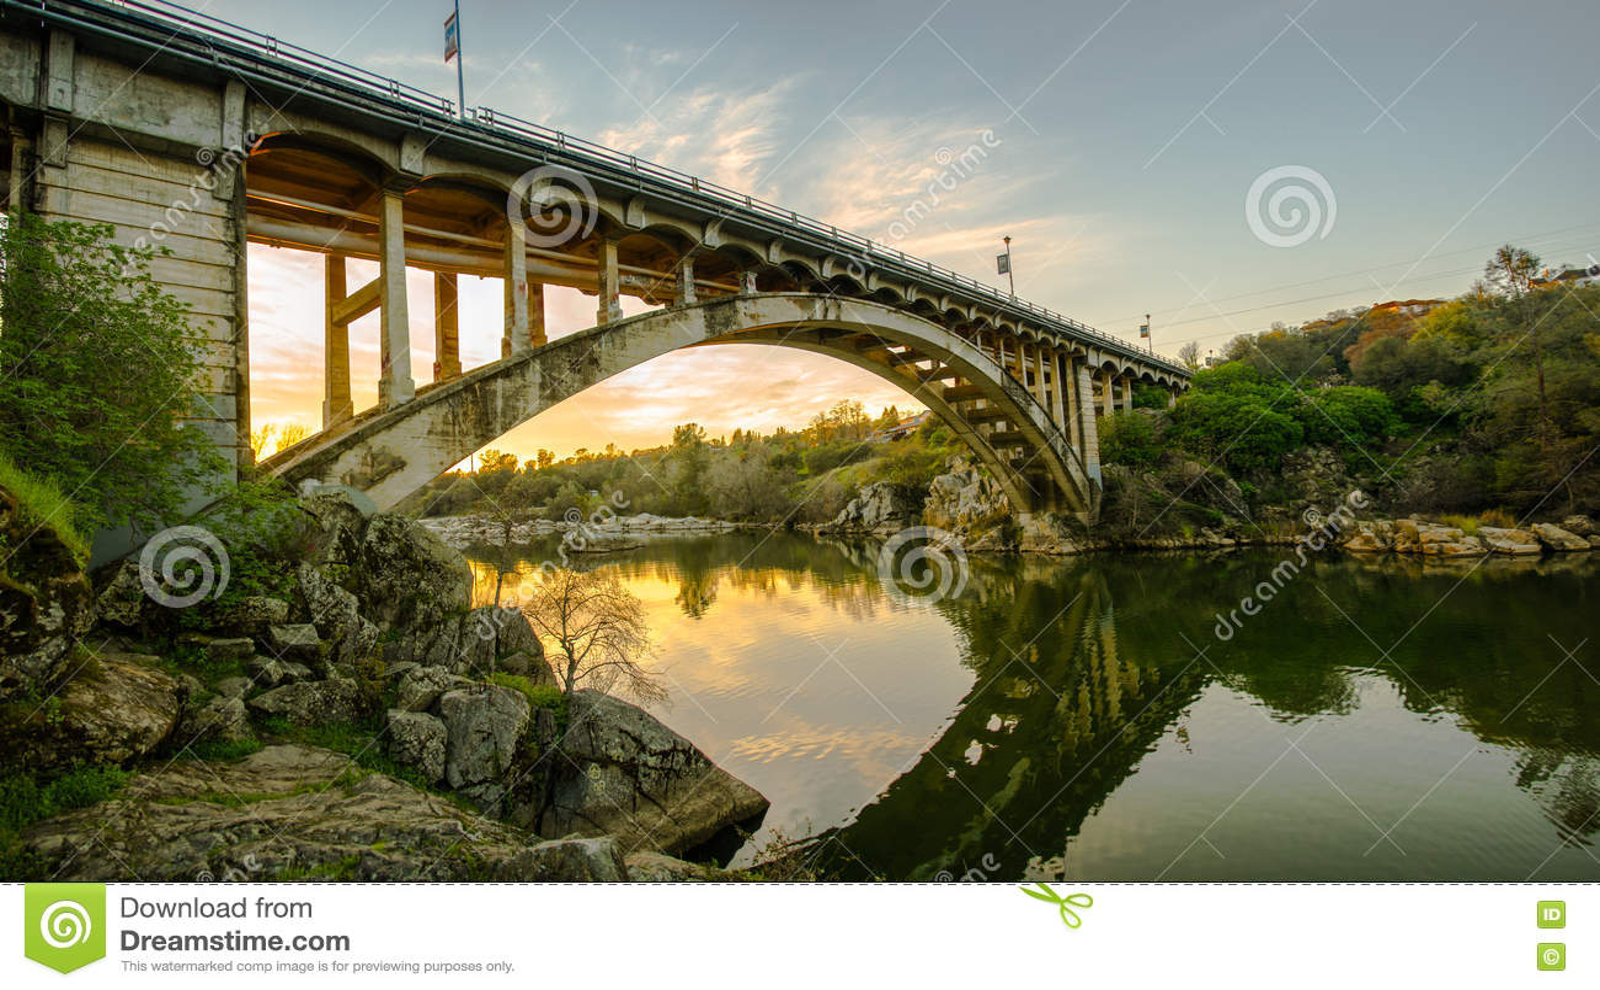 Rainbow Bridge at Sunset in Folsom, CA